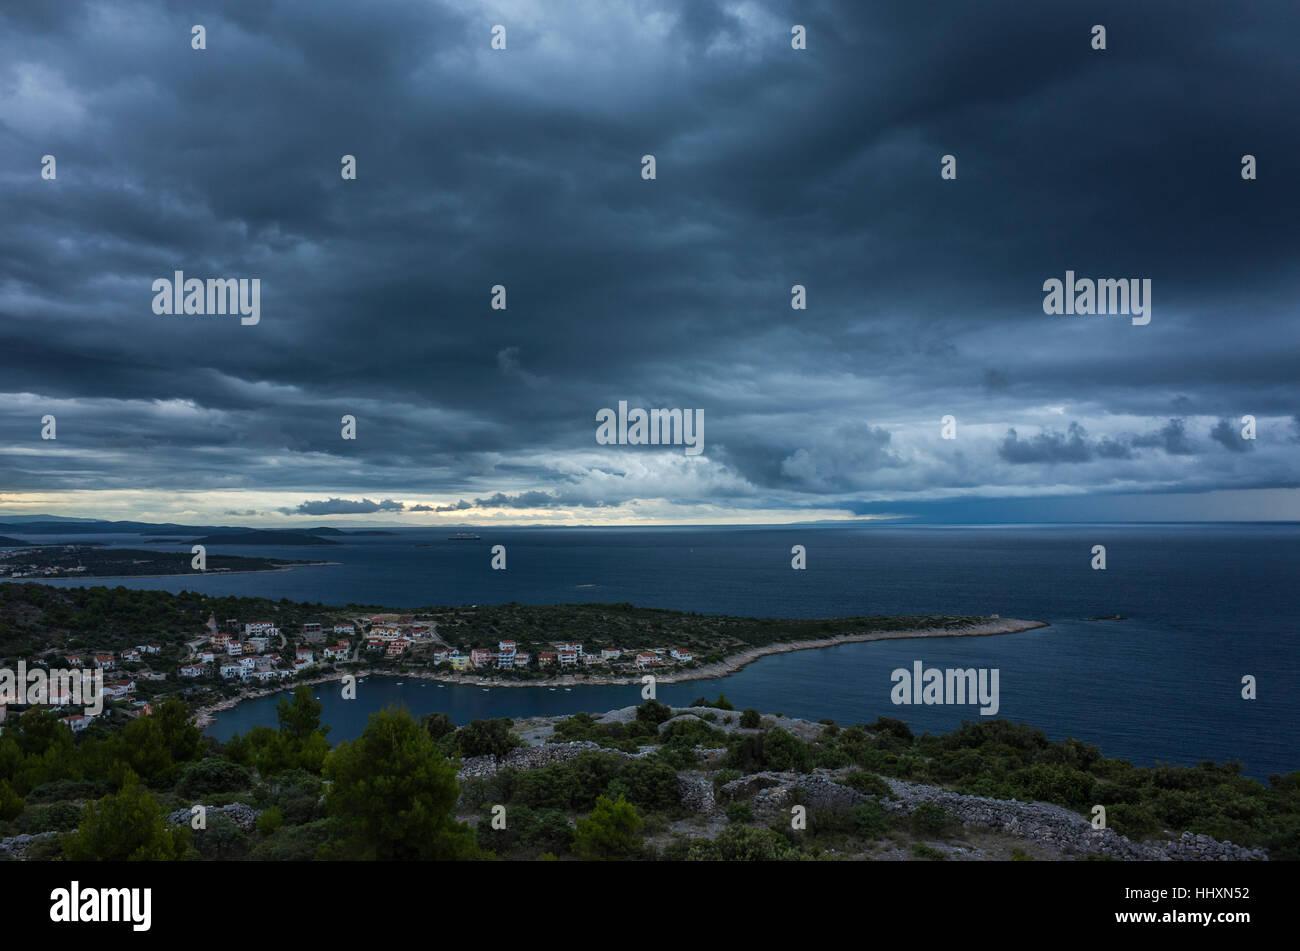 Storm clouds over Adriatic Sea Croatia - Stock Image